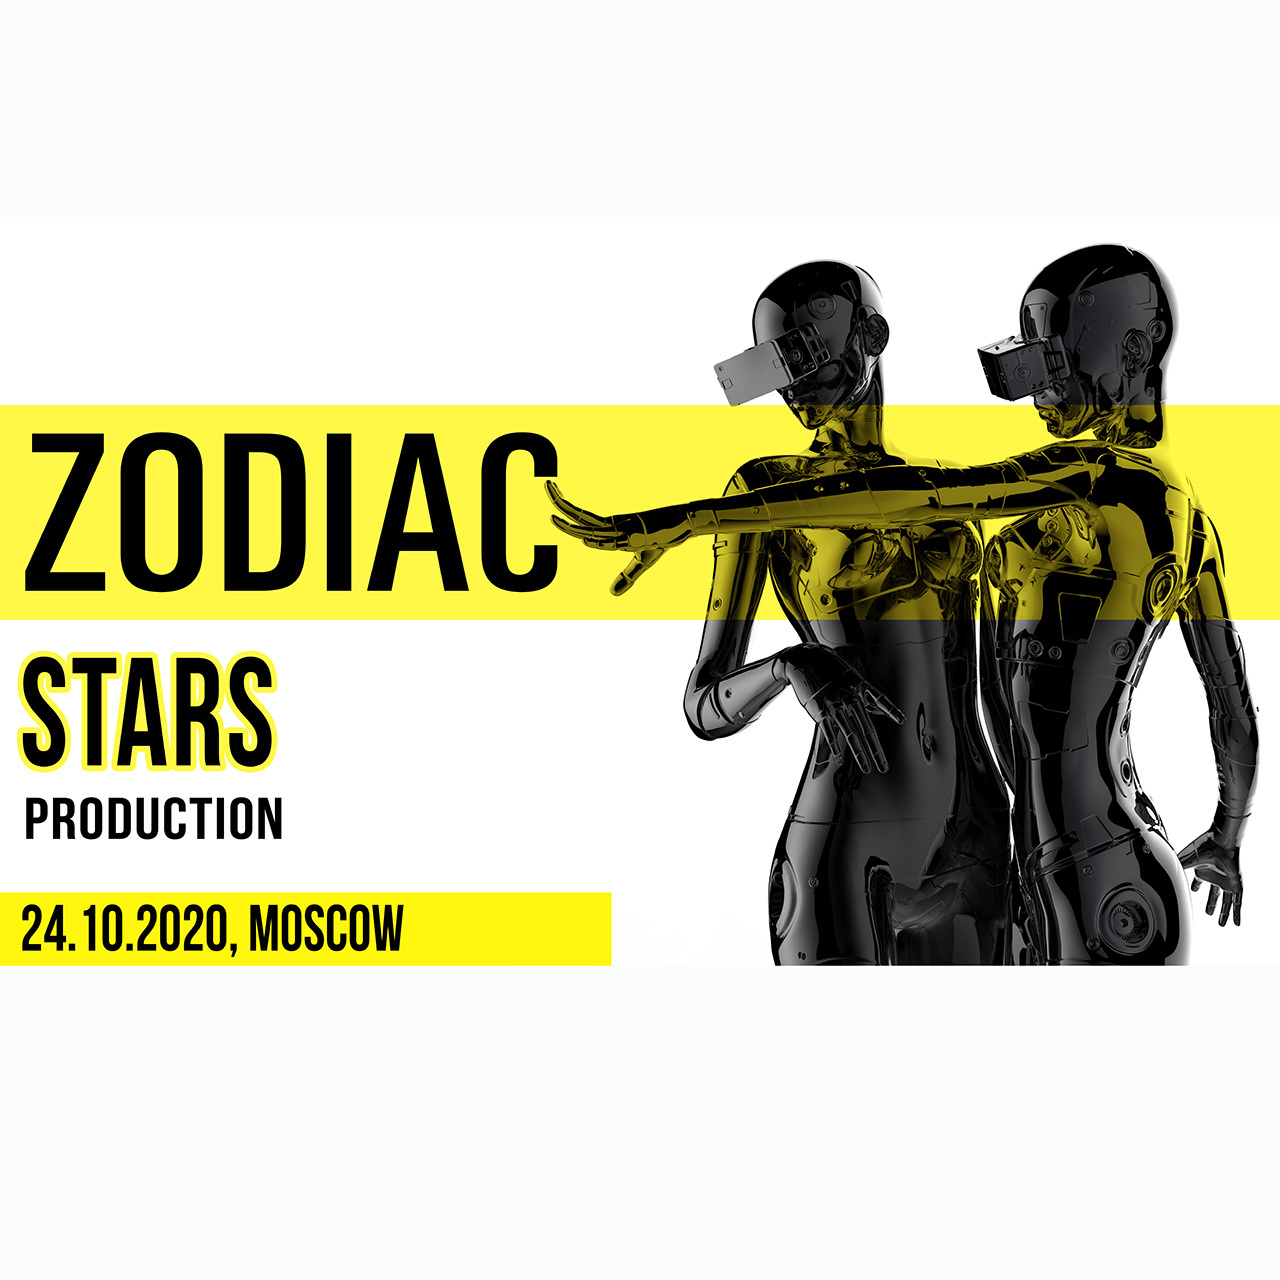 Zodiacmillennium 2019